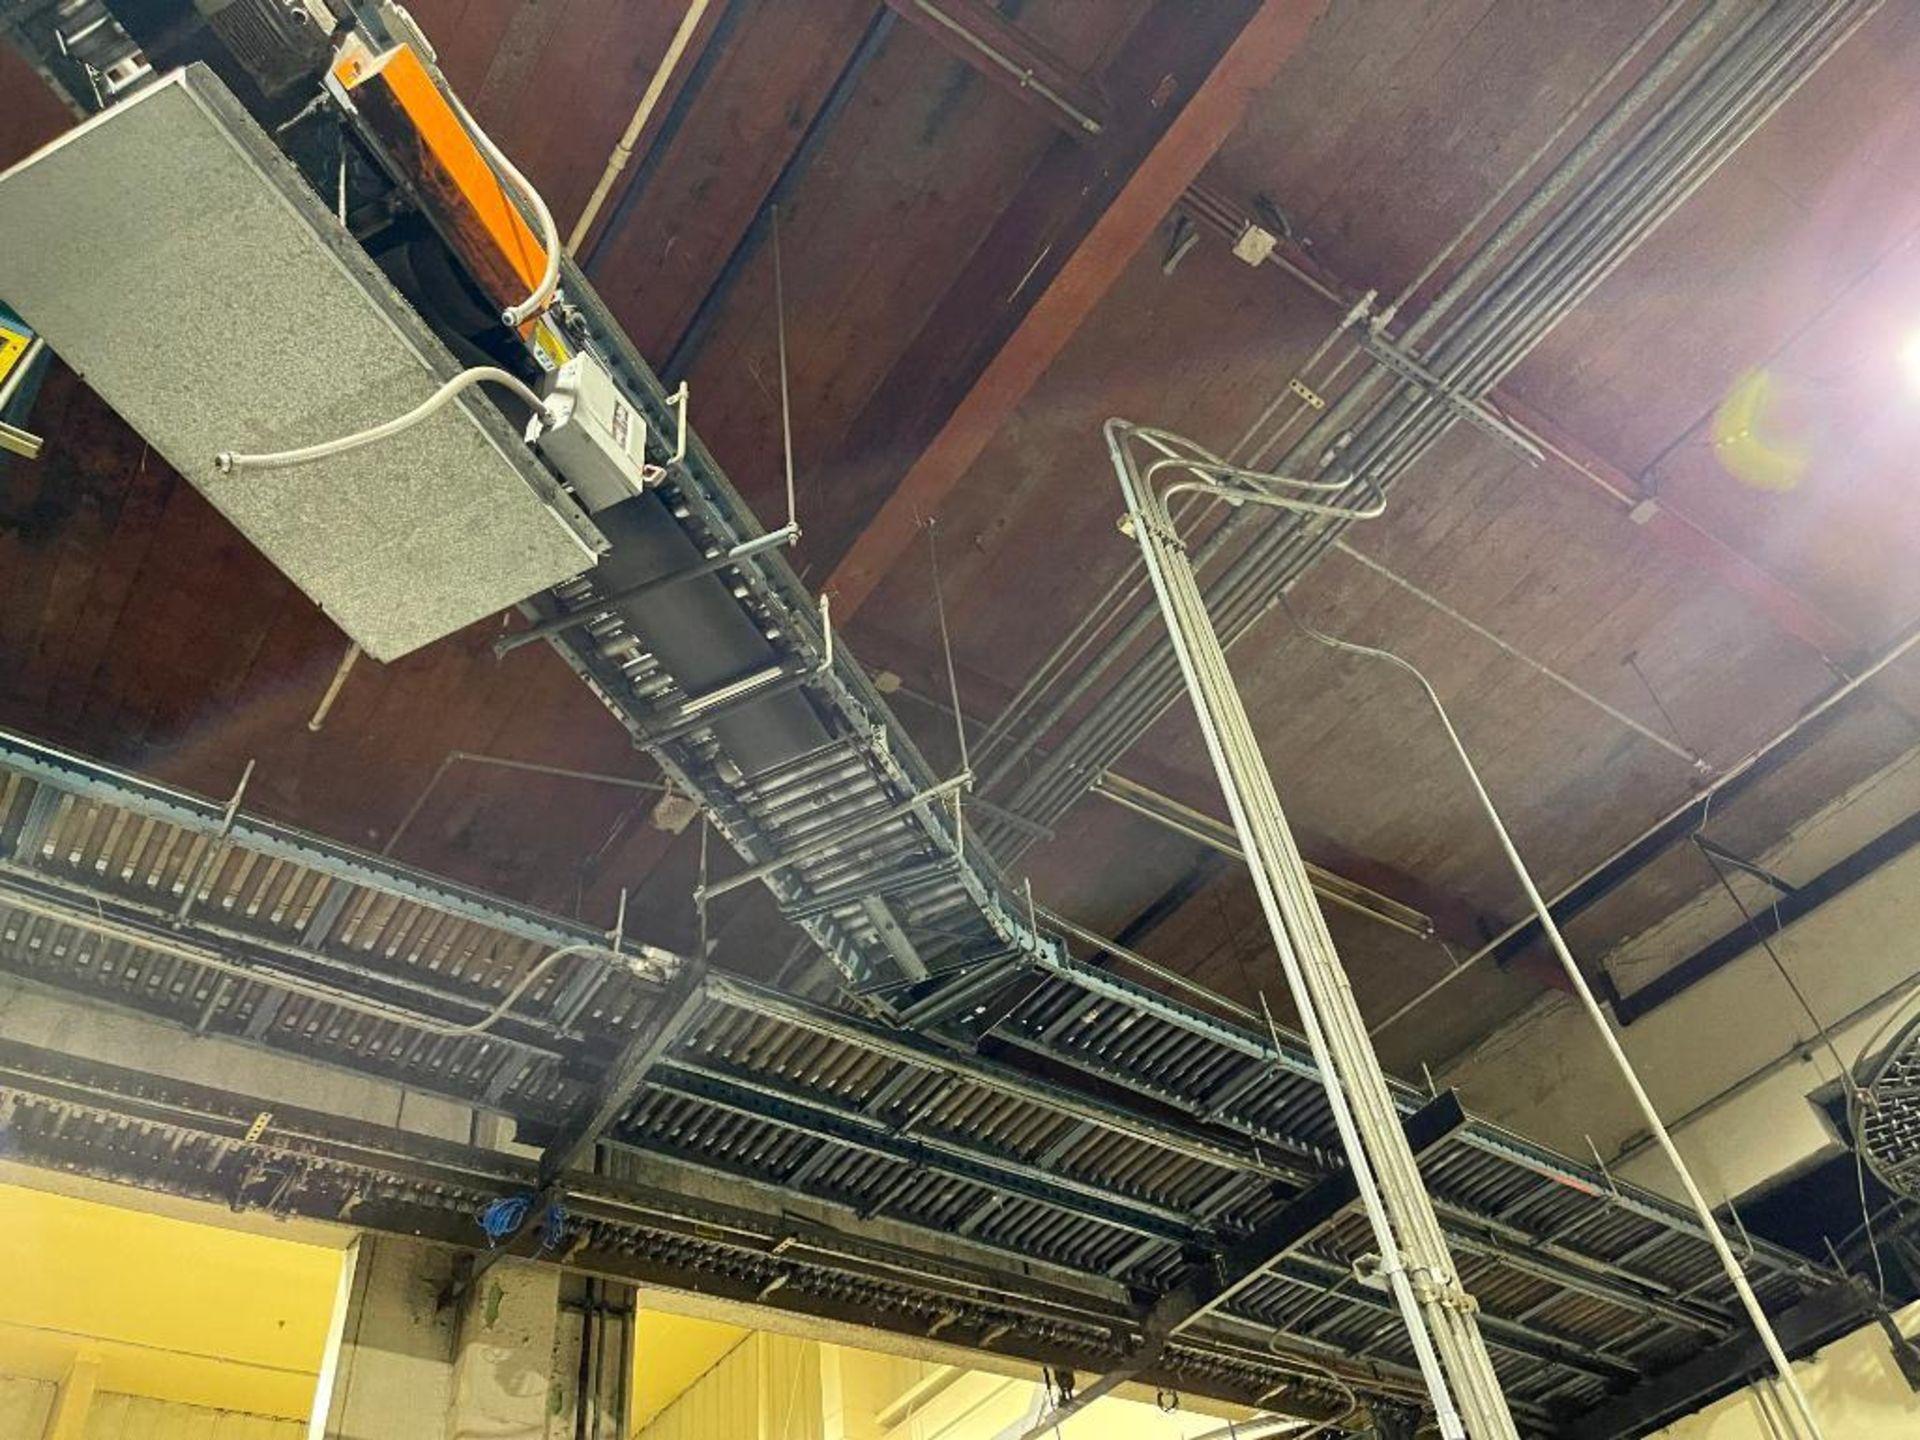 overhead power case conveyor - Image 4 of 9